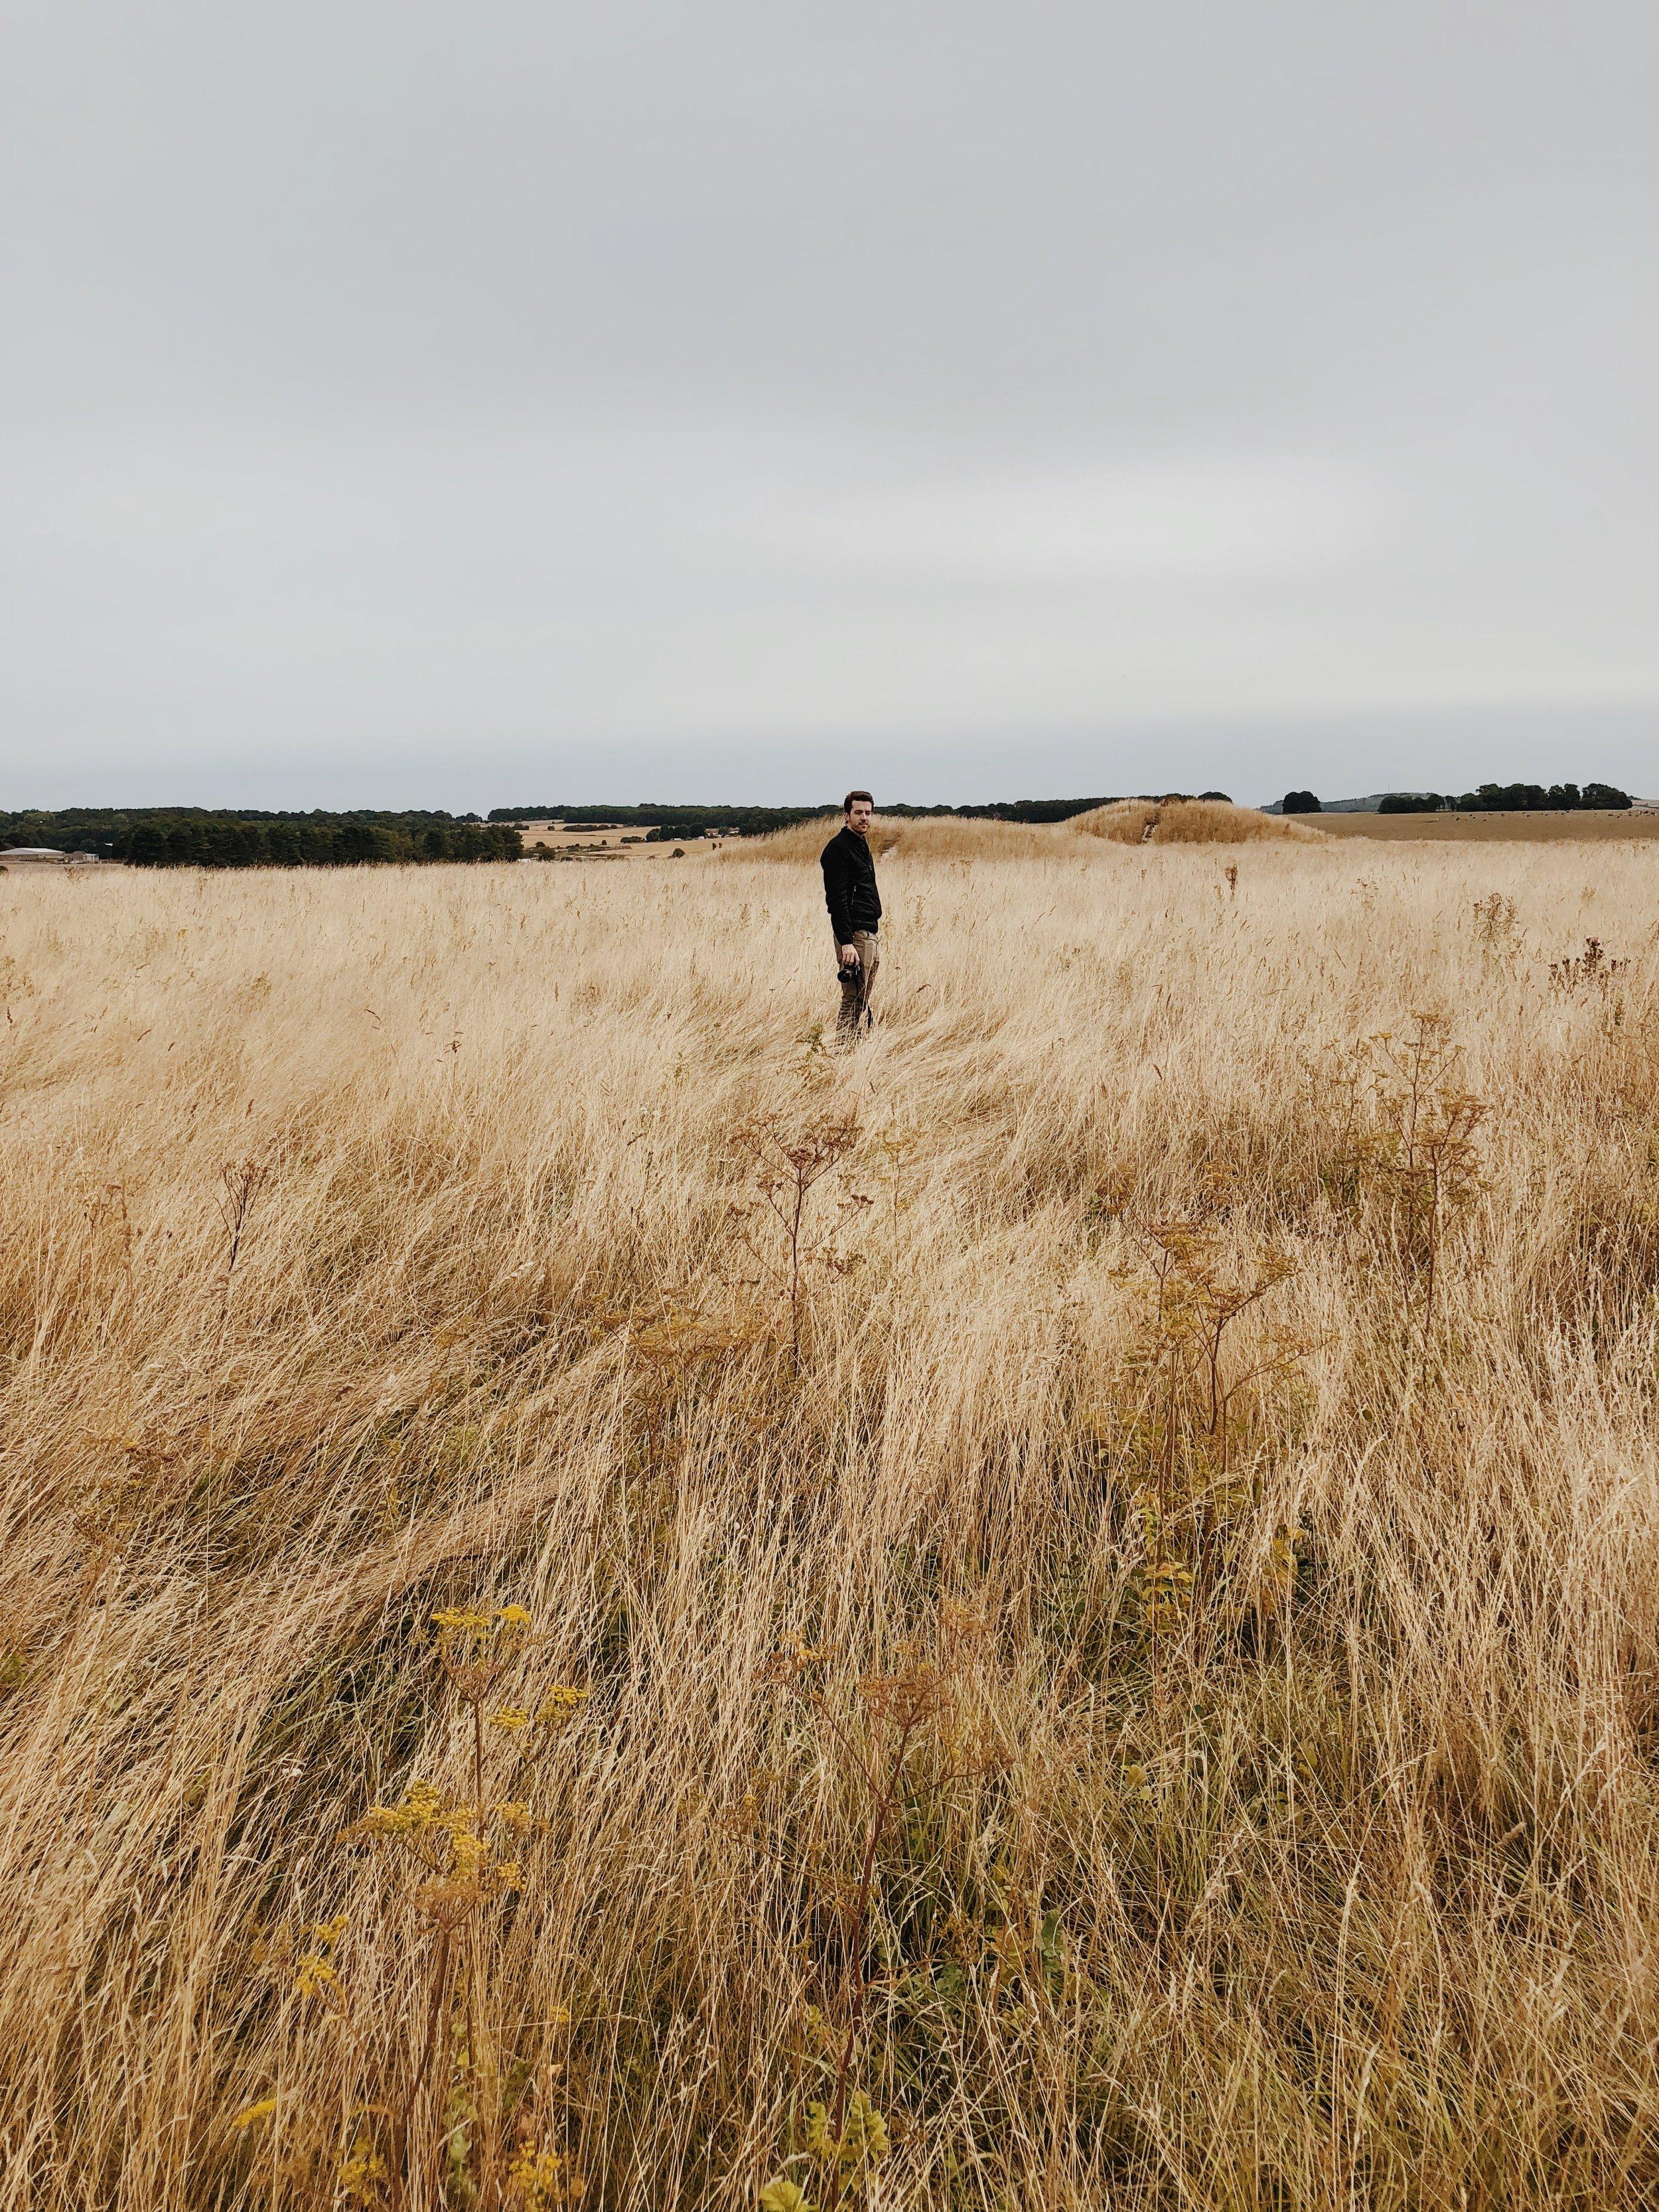 Does Traveling Make Us Natural Minimalists?